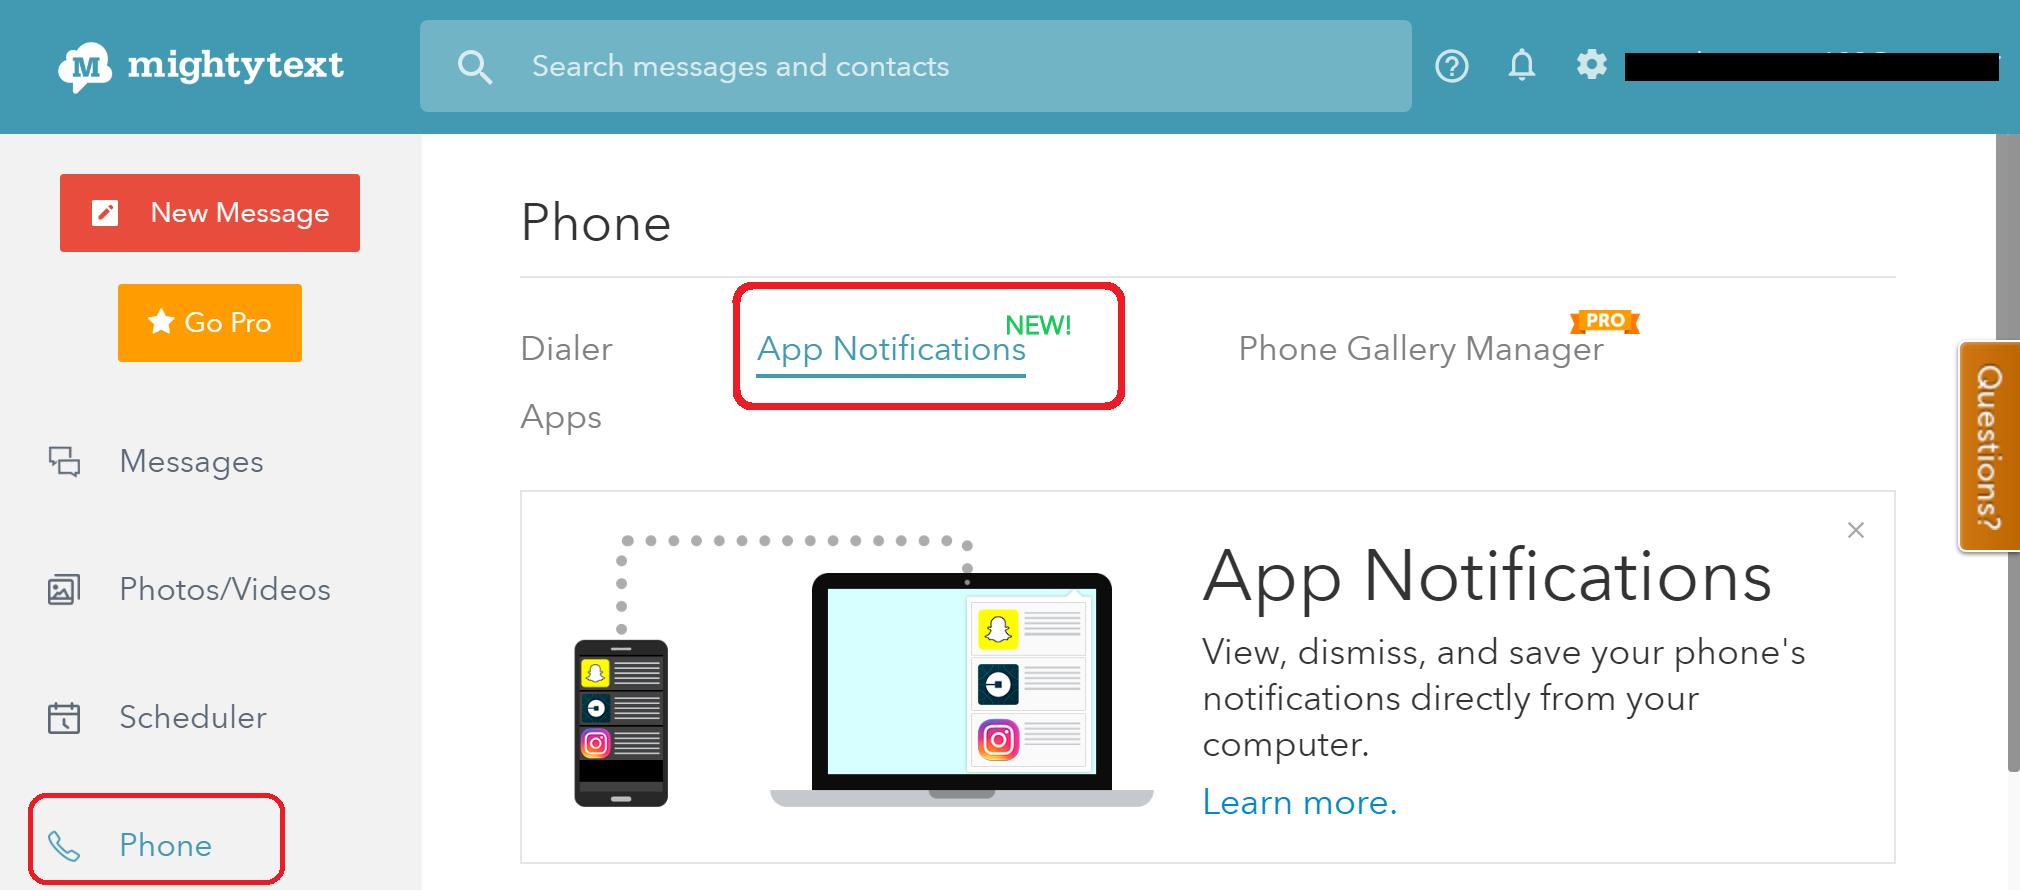 mightytext app notifications